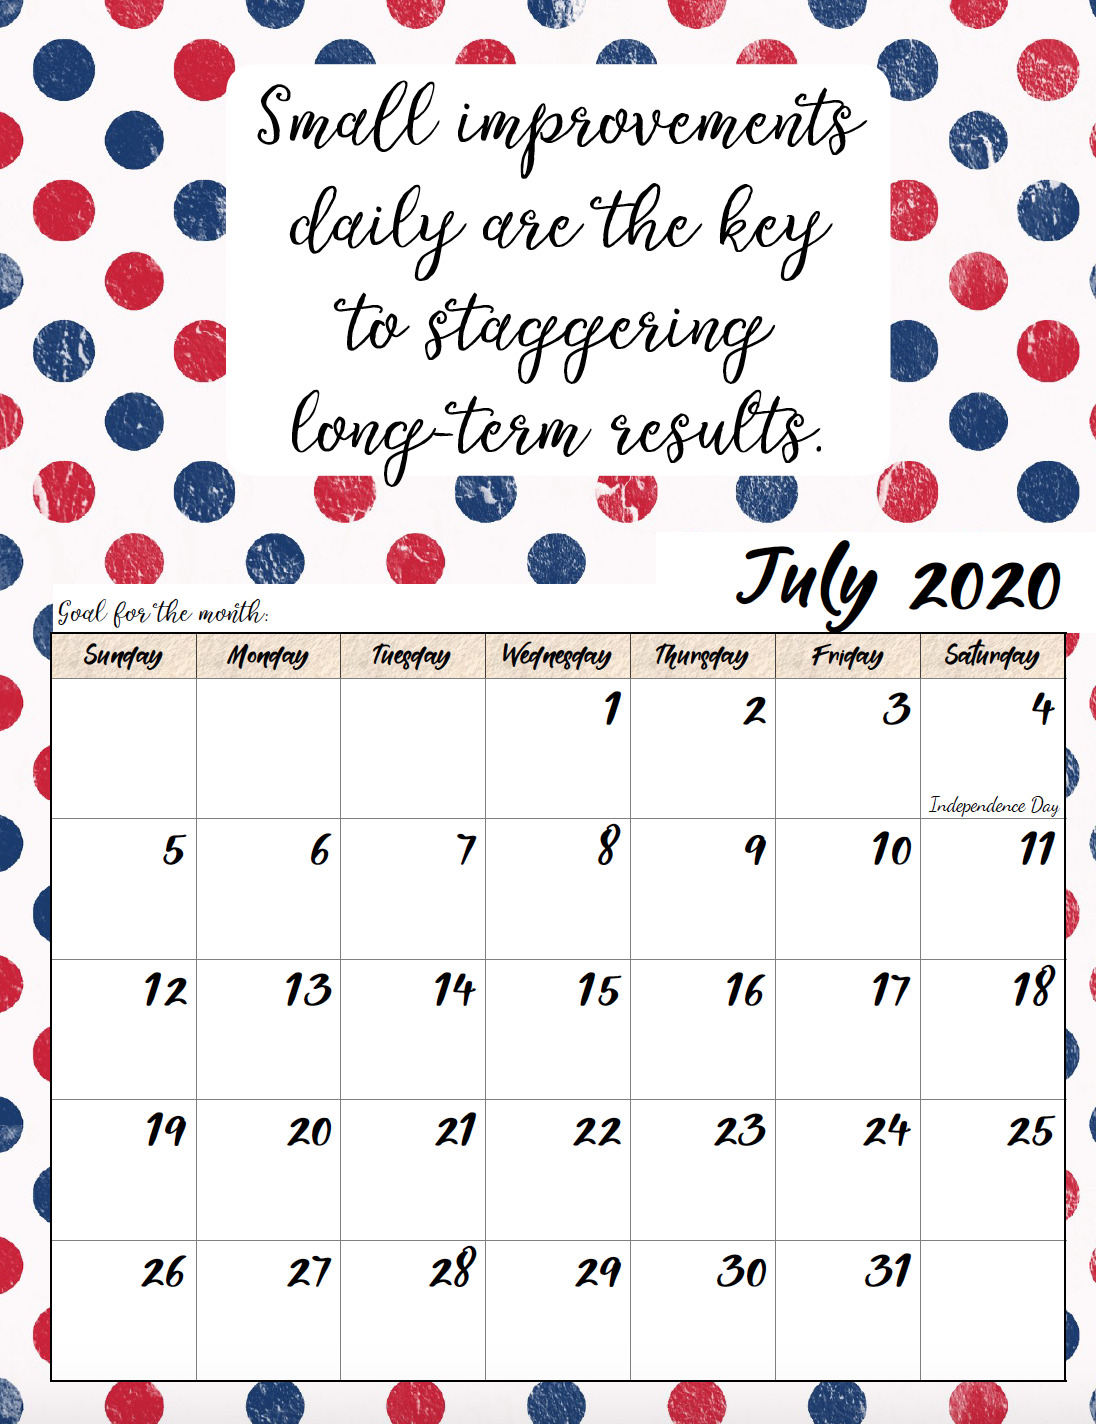 Free printable July 2020 monthly motivational calendar.